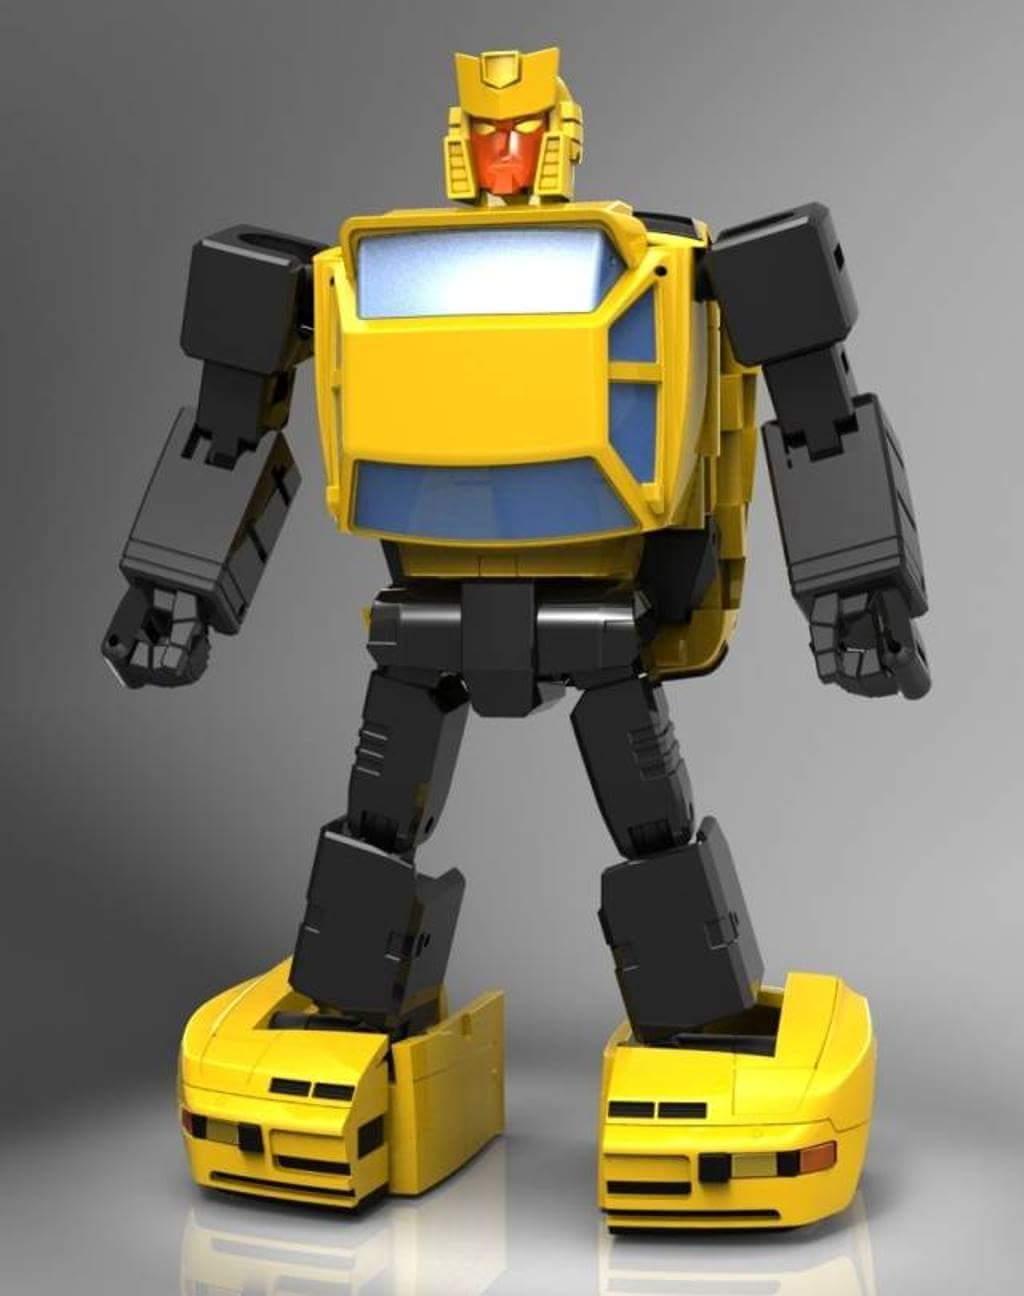 [X-Transbots] Produit Tiers - Minibots MP - Gamme MM - Page 9 S4Vjda2a